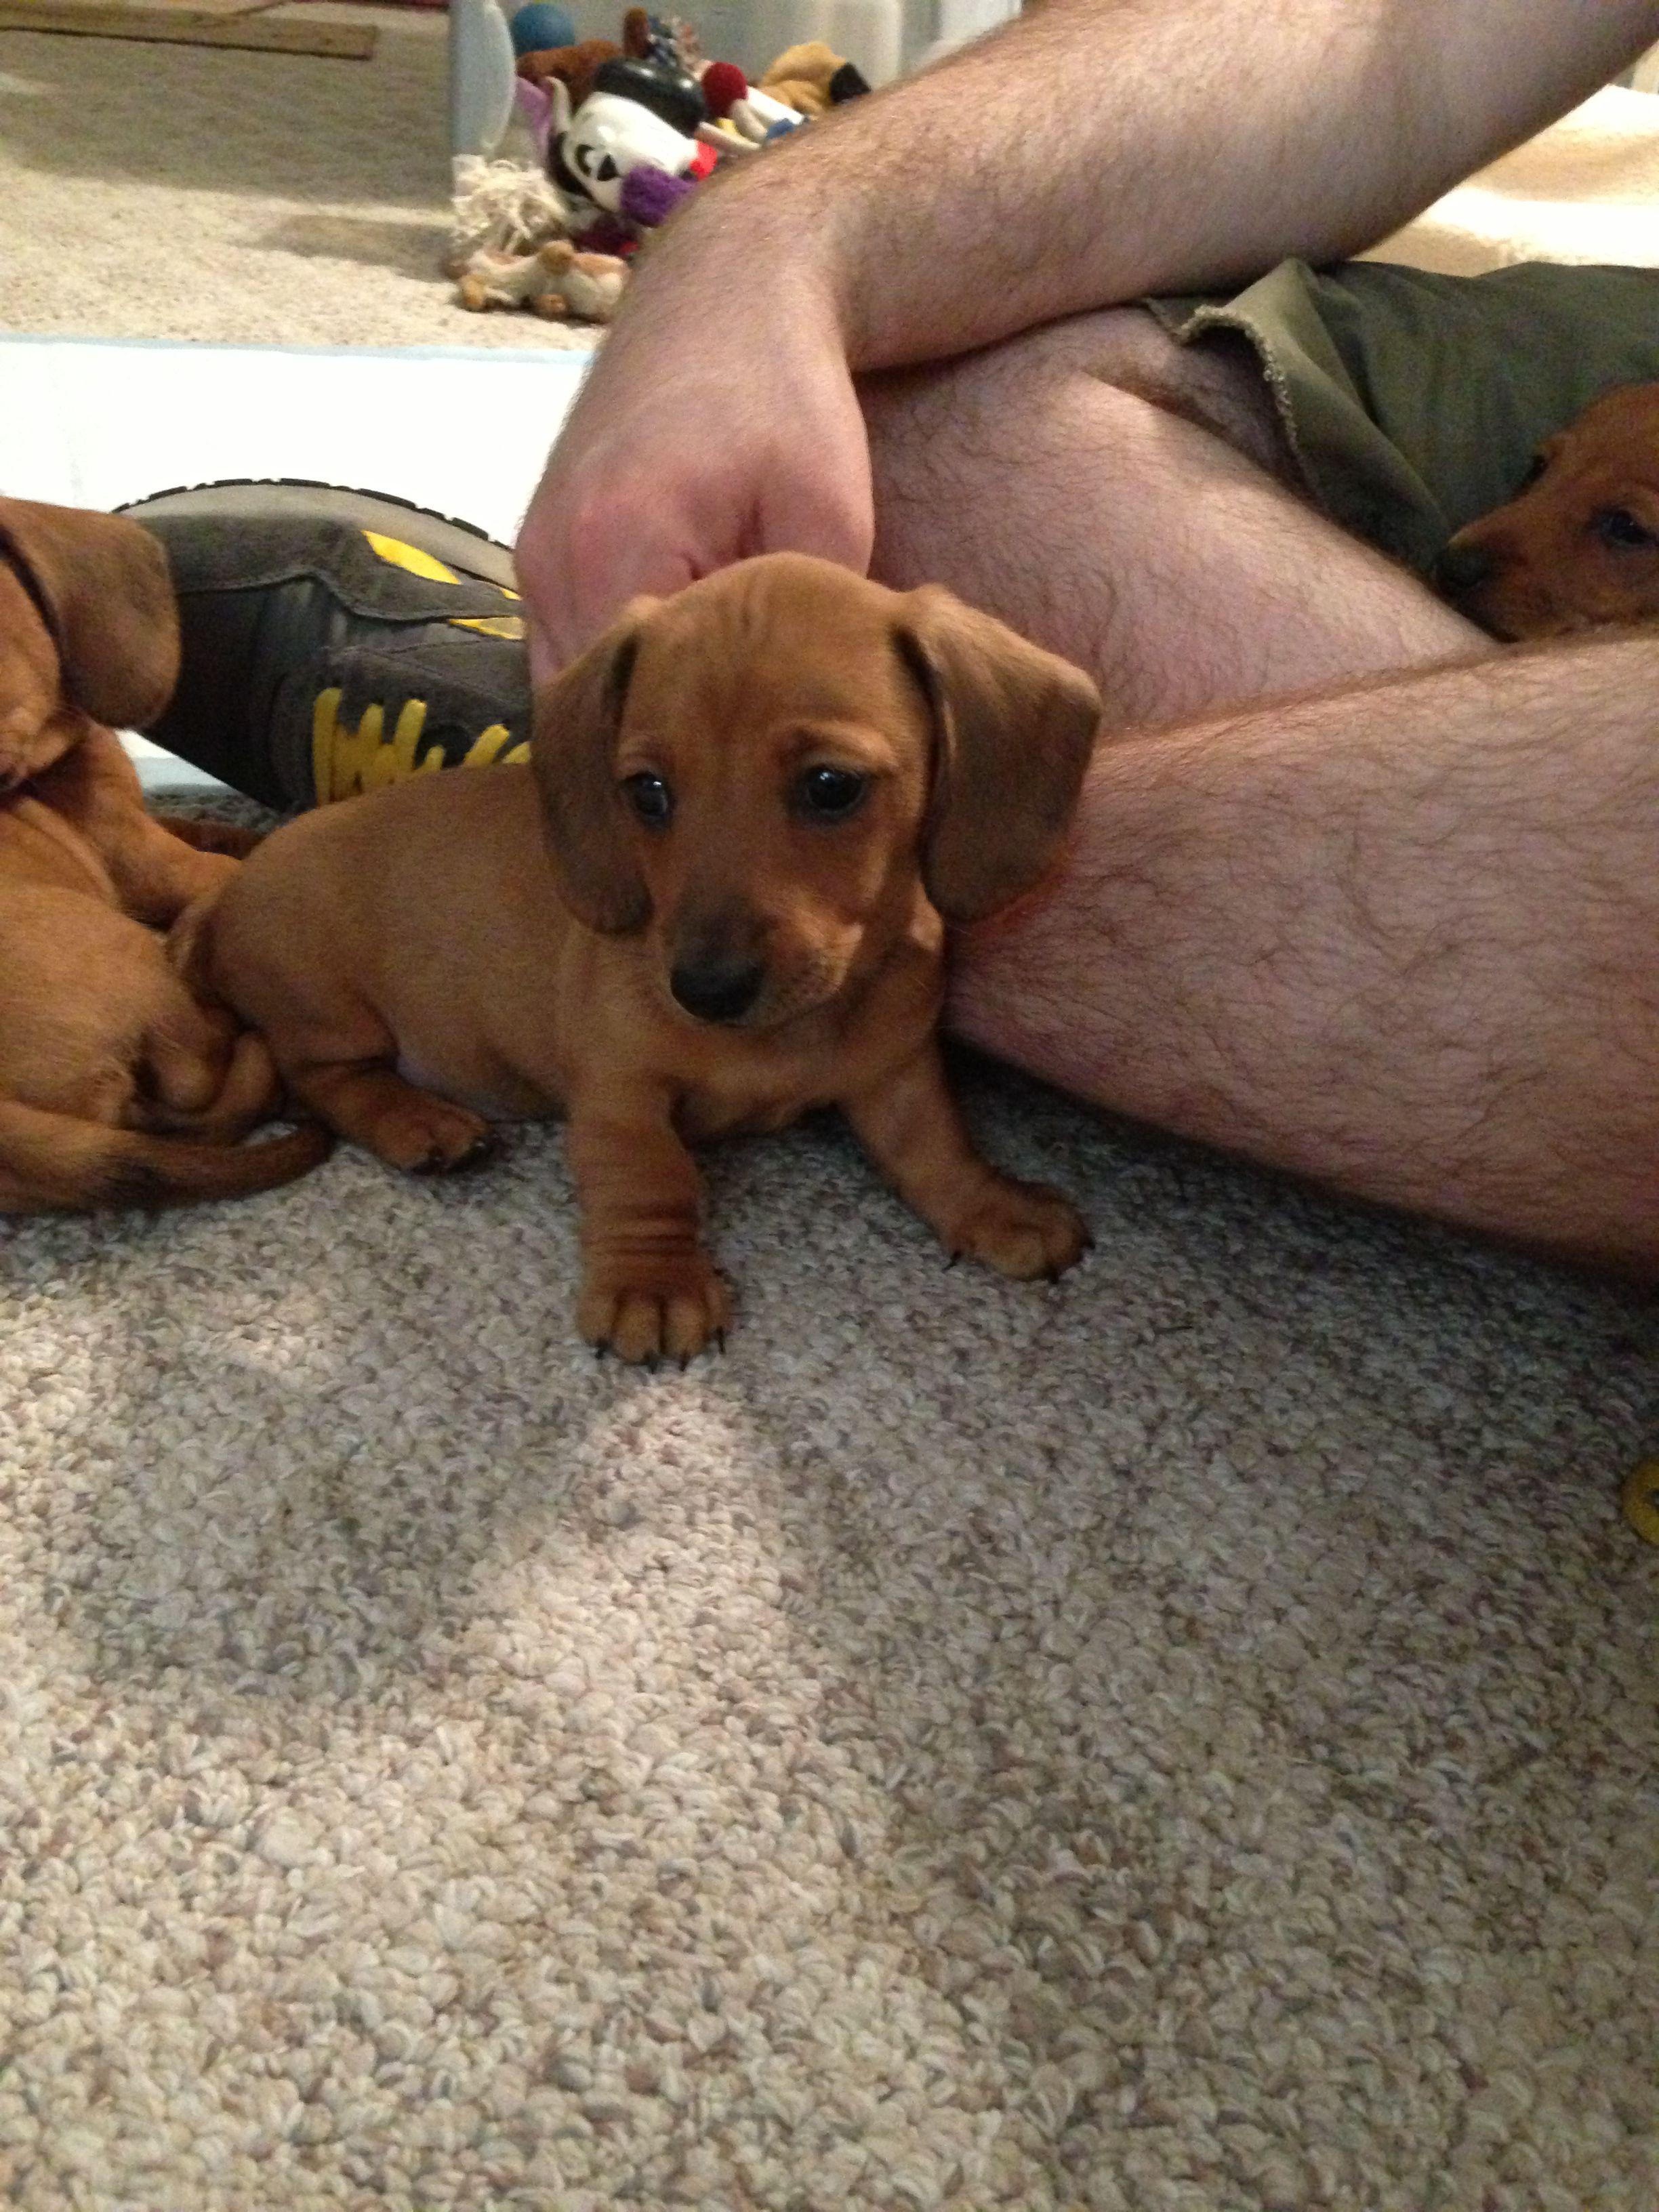 Dachshund Friendly And Curious Dachshund Puppies Puppies